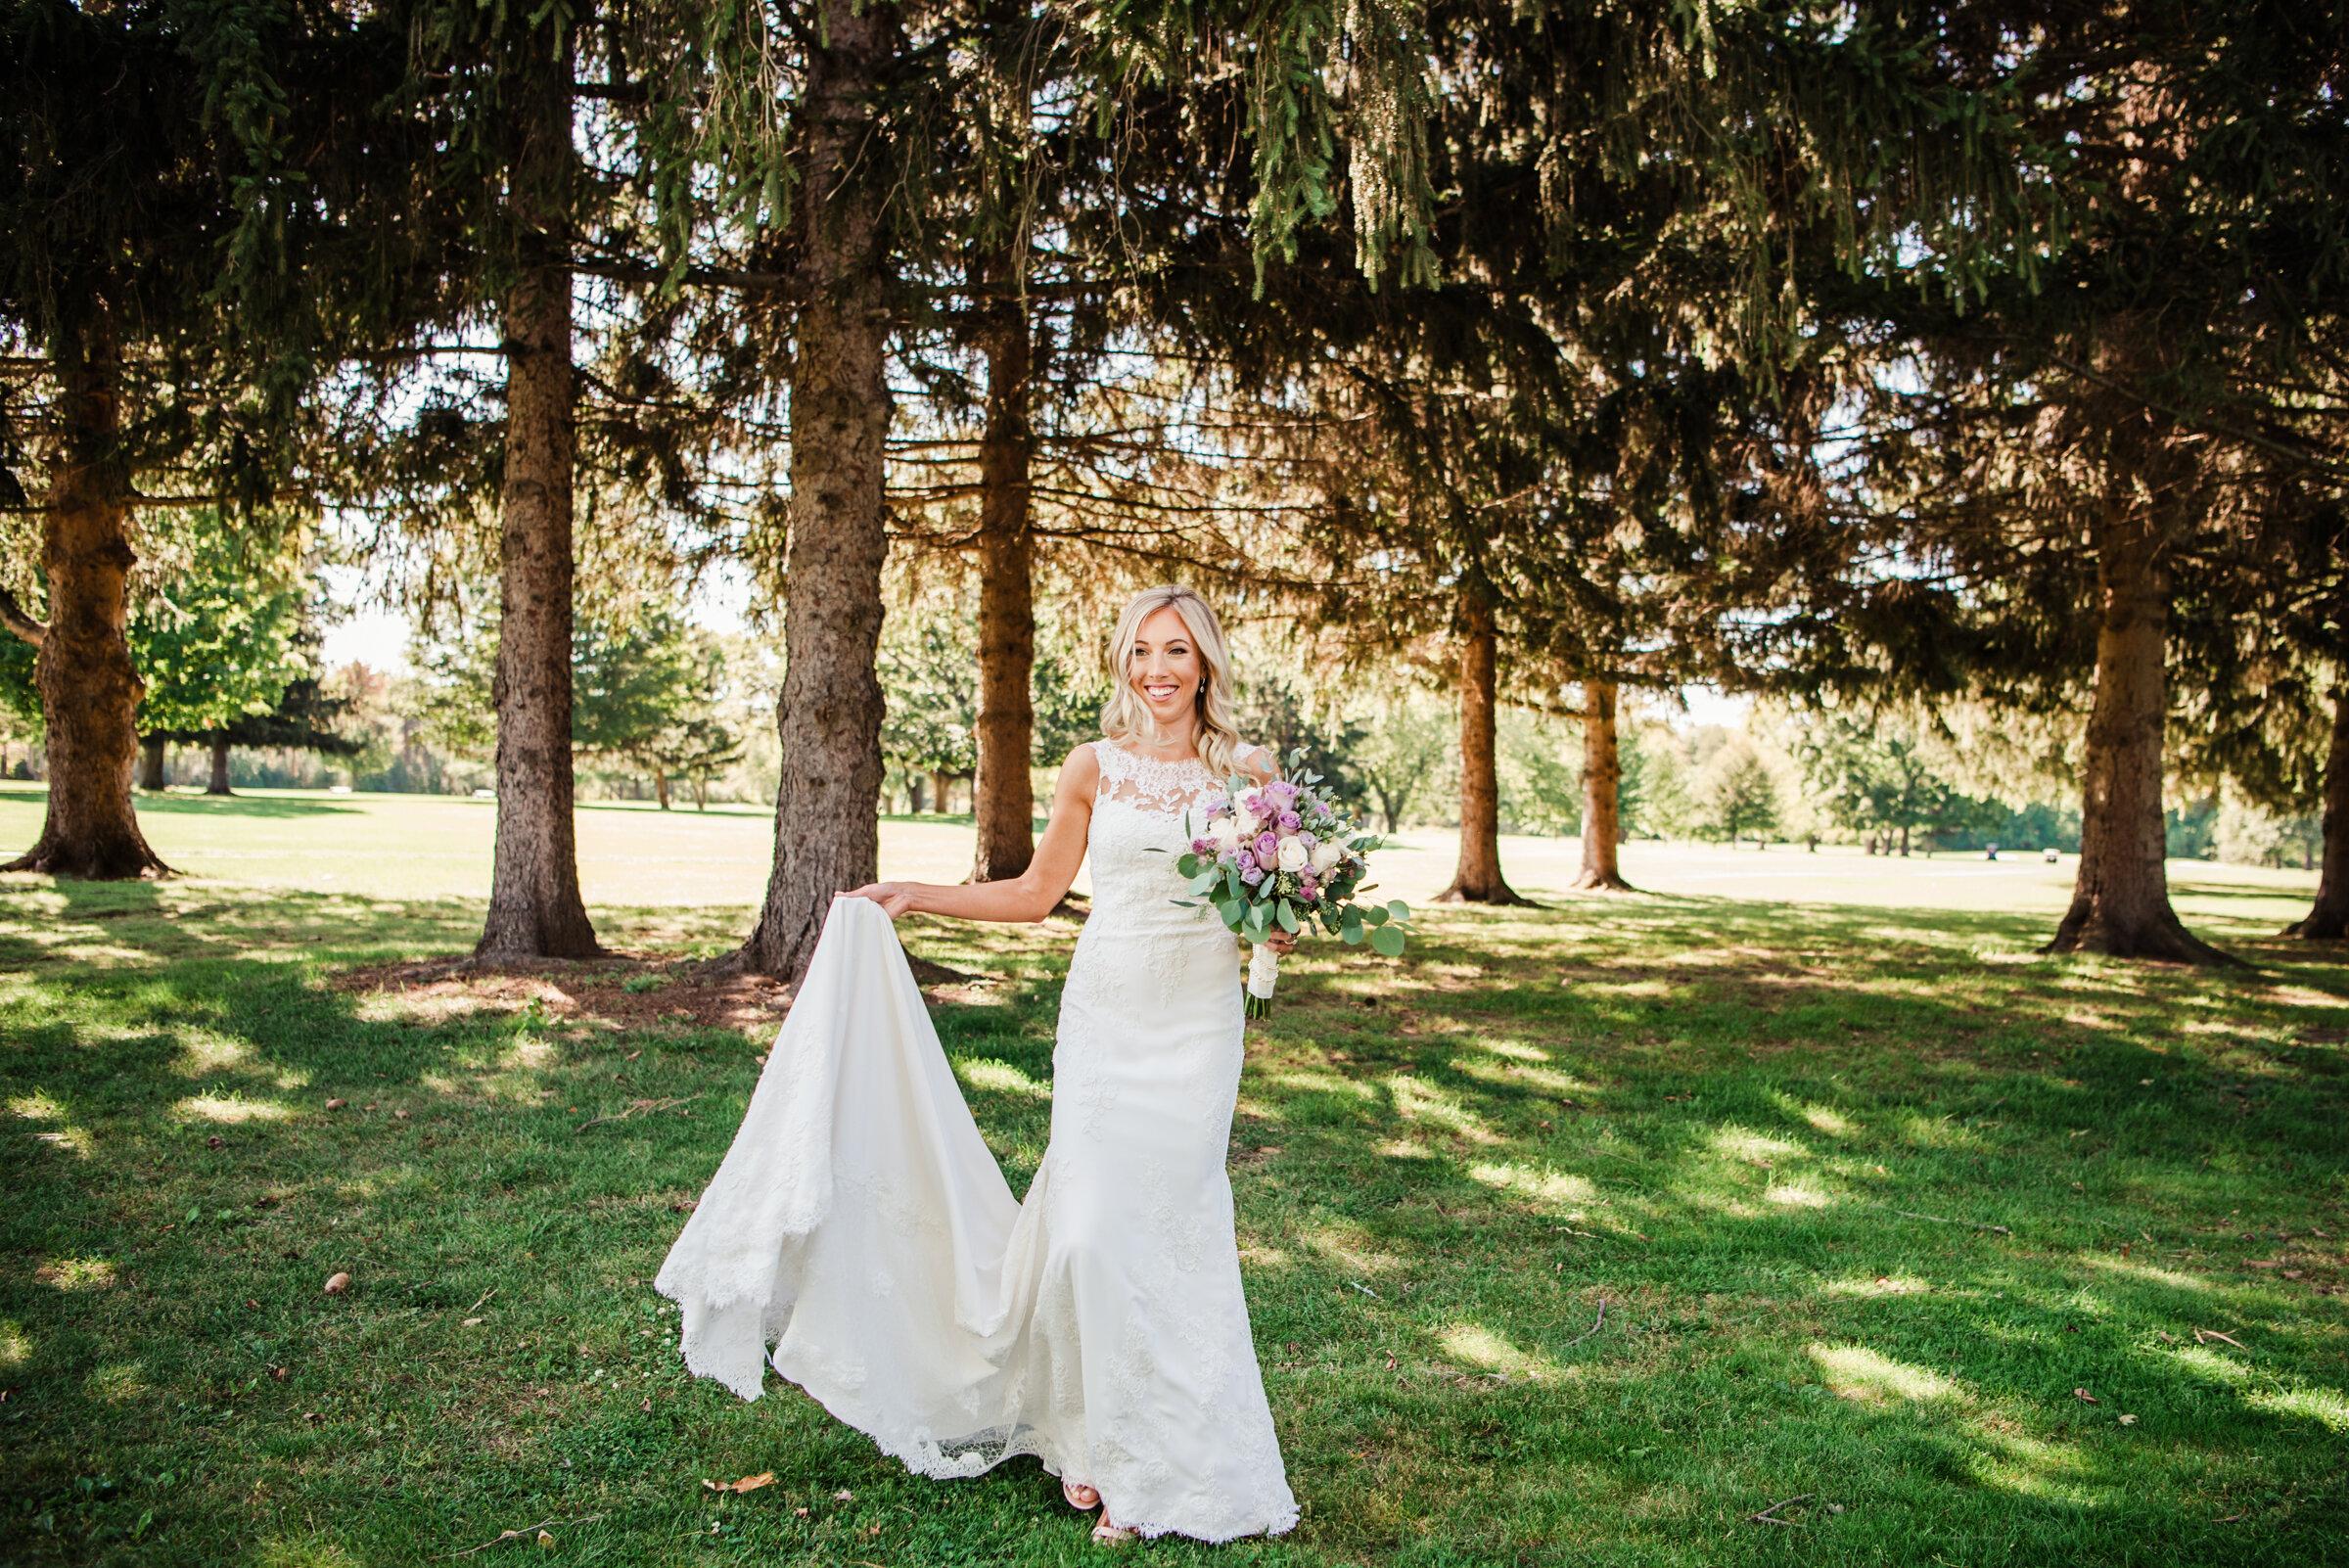 Deerfield_Country_Club_Rochester_Wedding_JILL_STUDIO_Rochester_NY_Photographer_DSC_6143.jpg